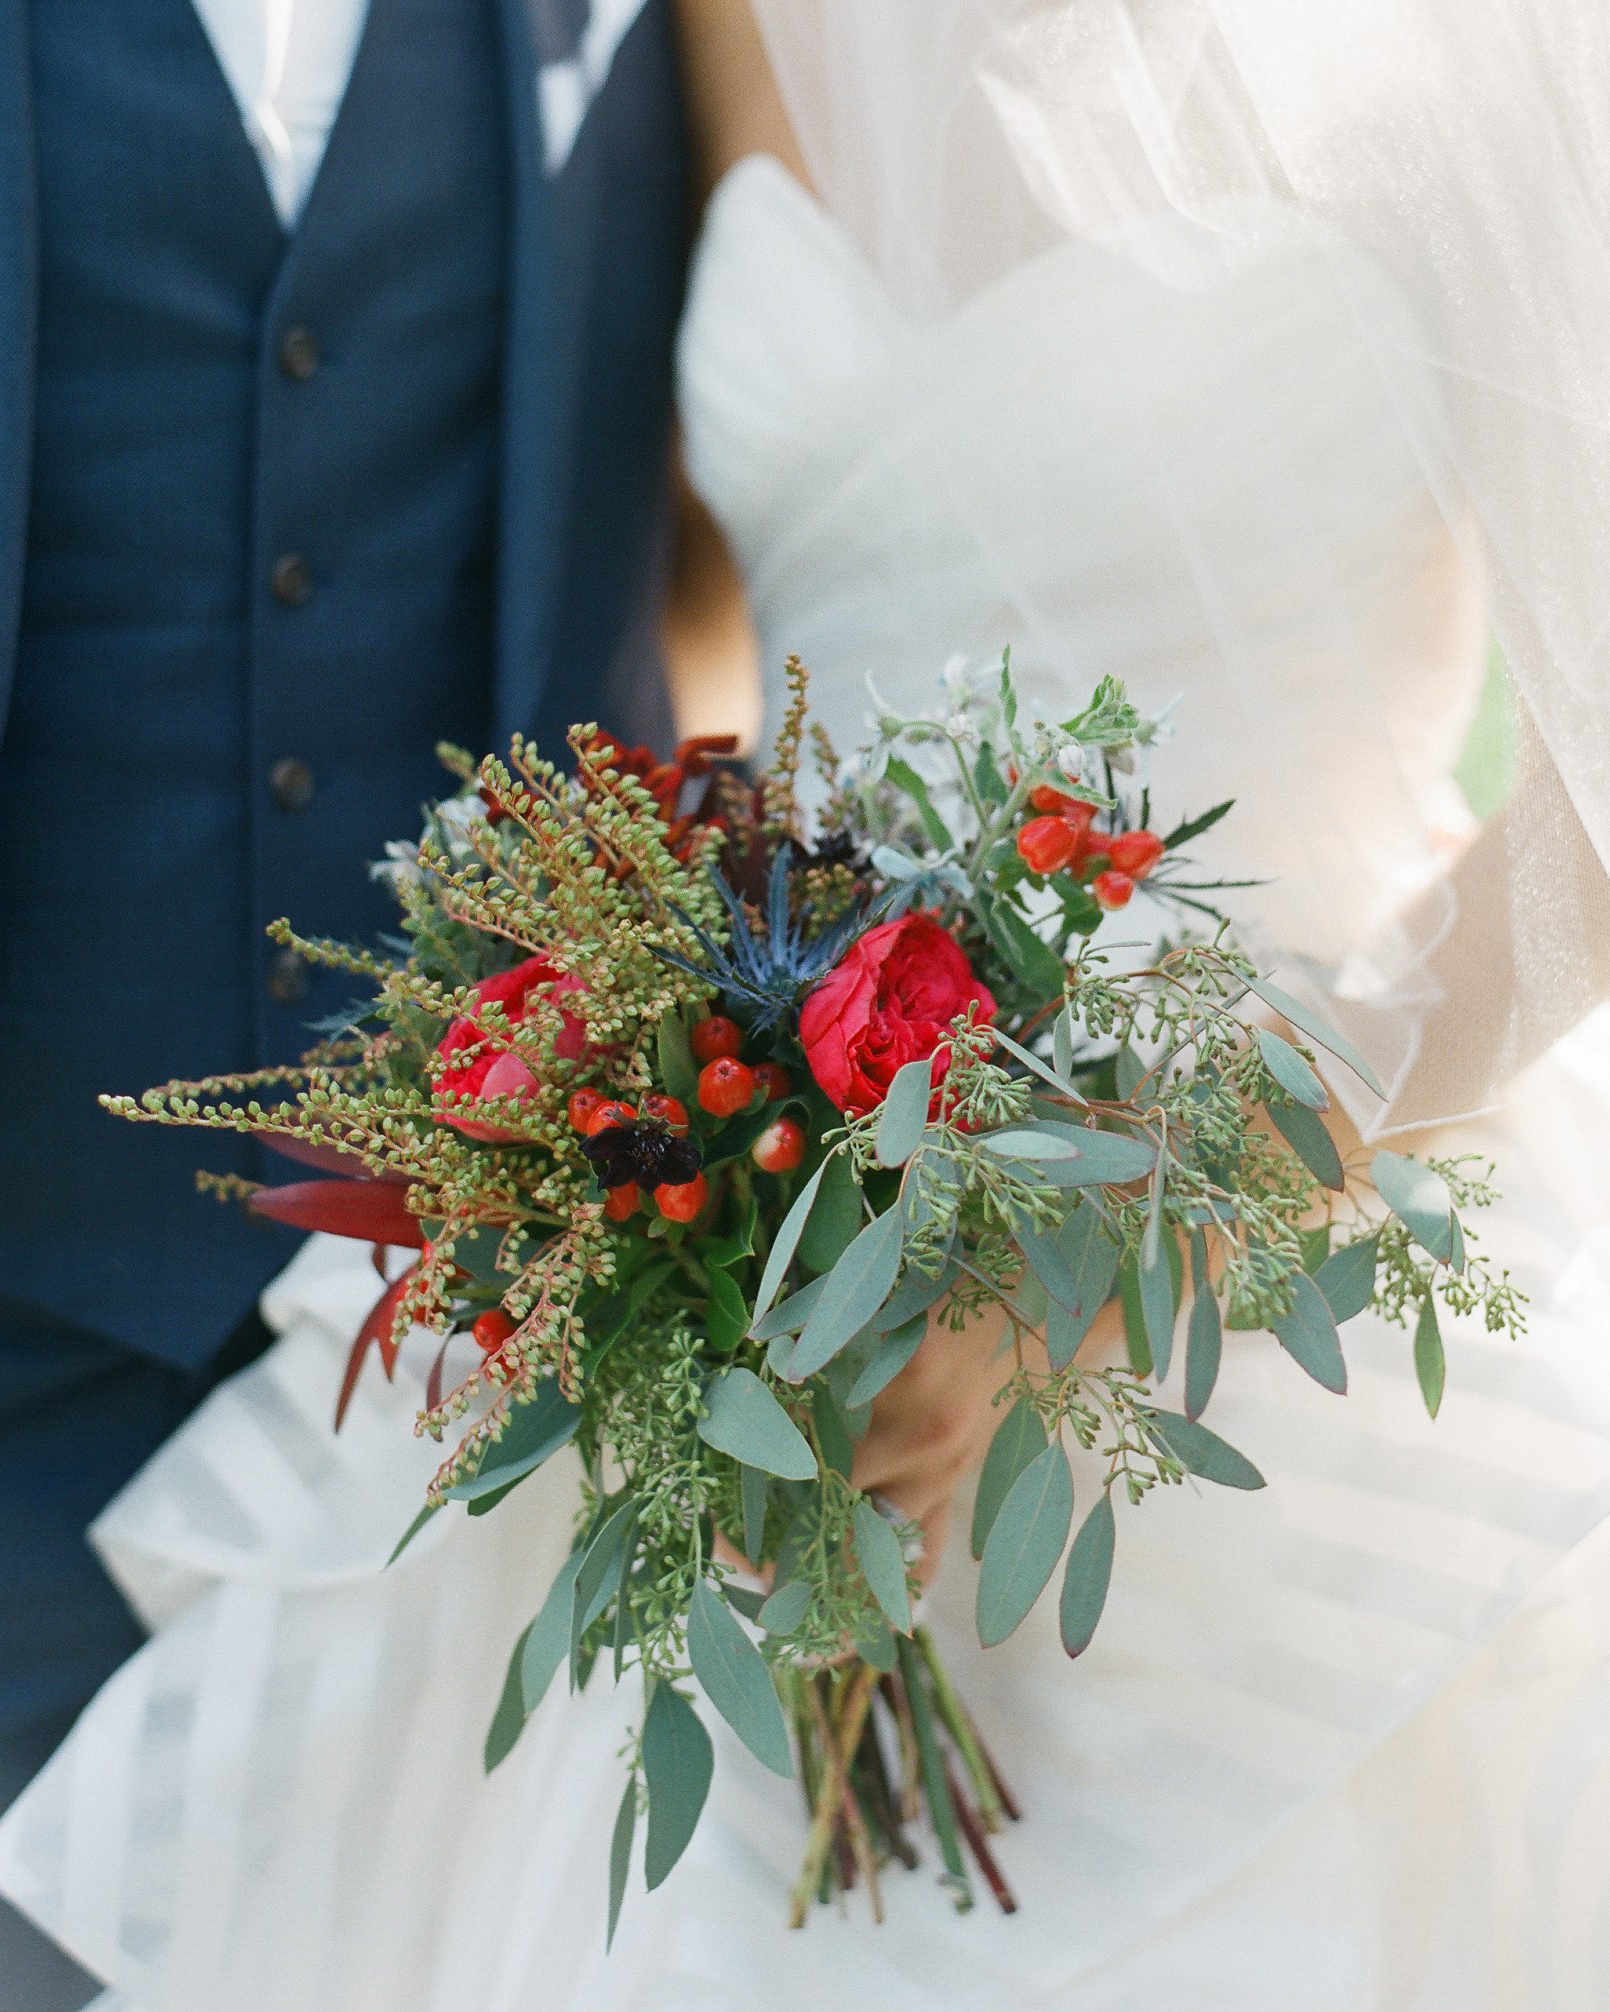 stacey-eric-wedding-bouquet-50-s111513-1014.jpg